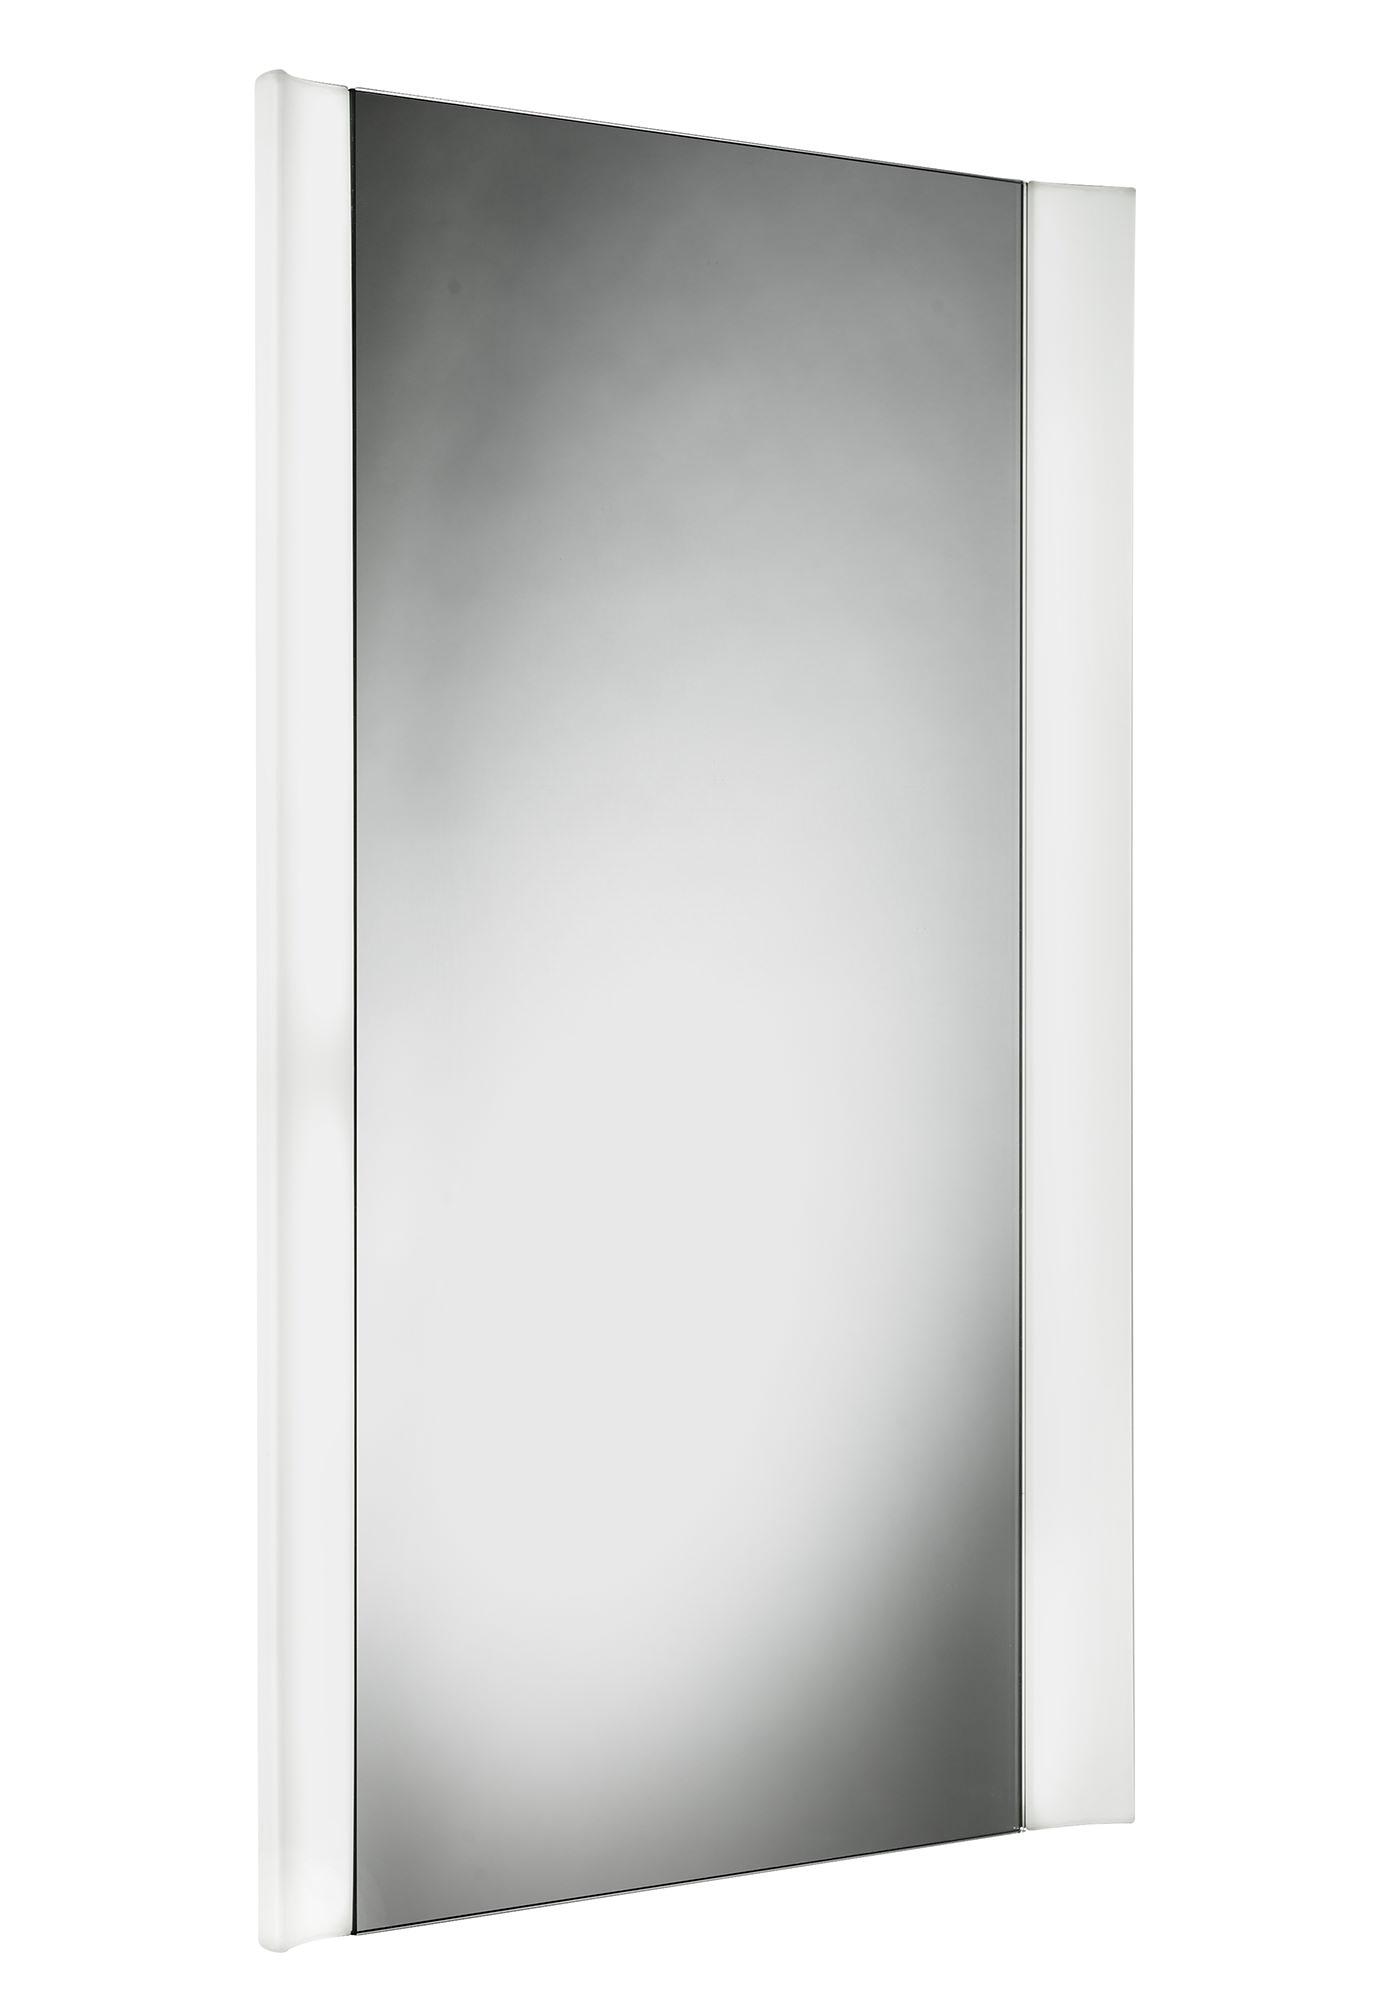 Roper rhodes trance illuminated mirror mle480 for Illuminated mirrors